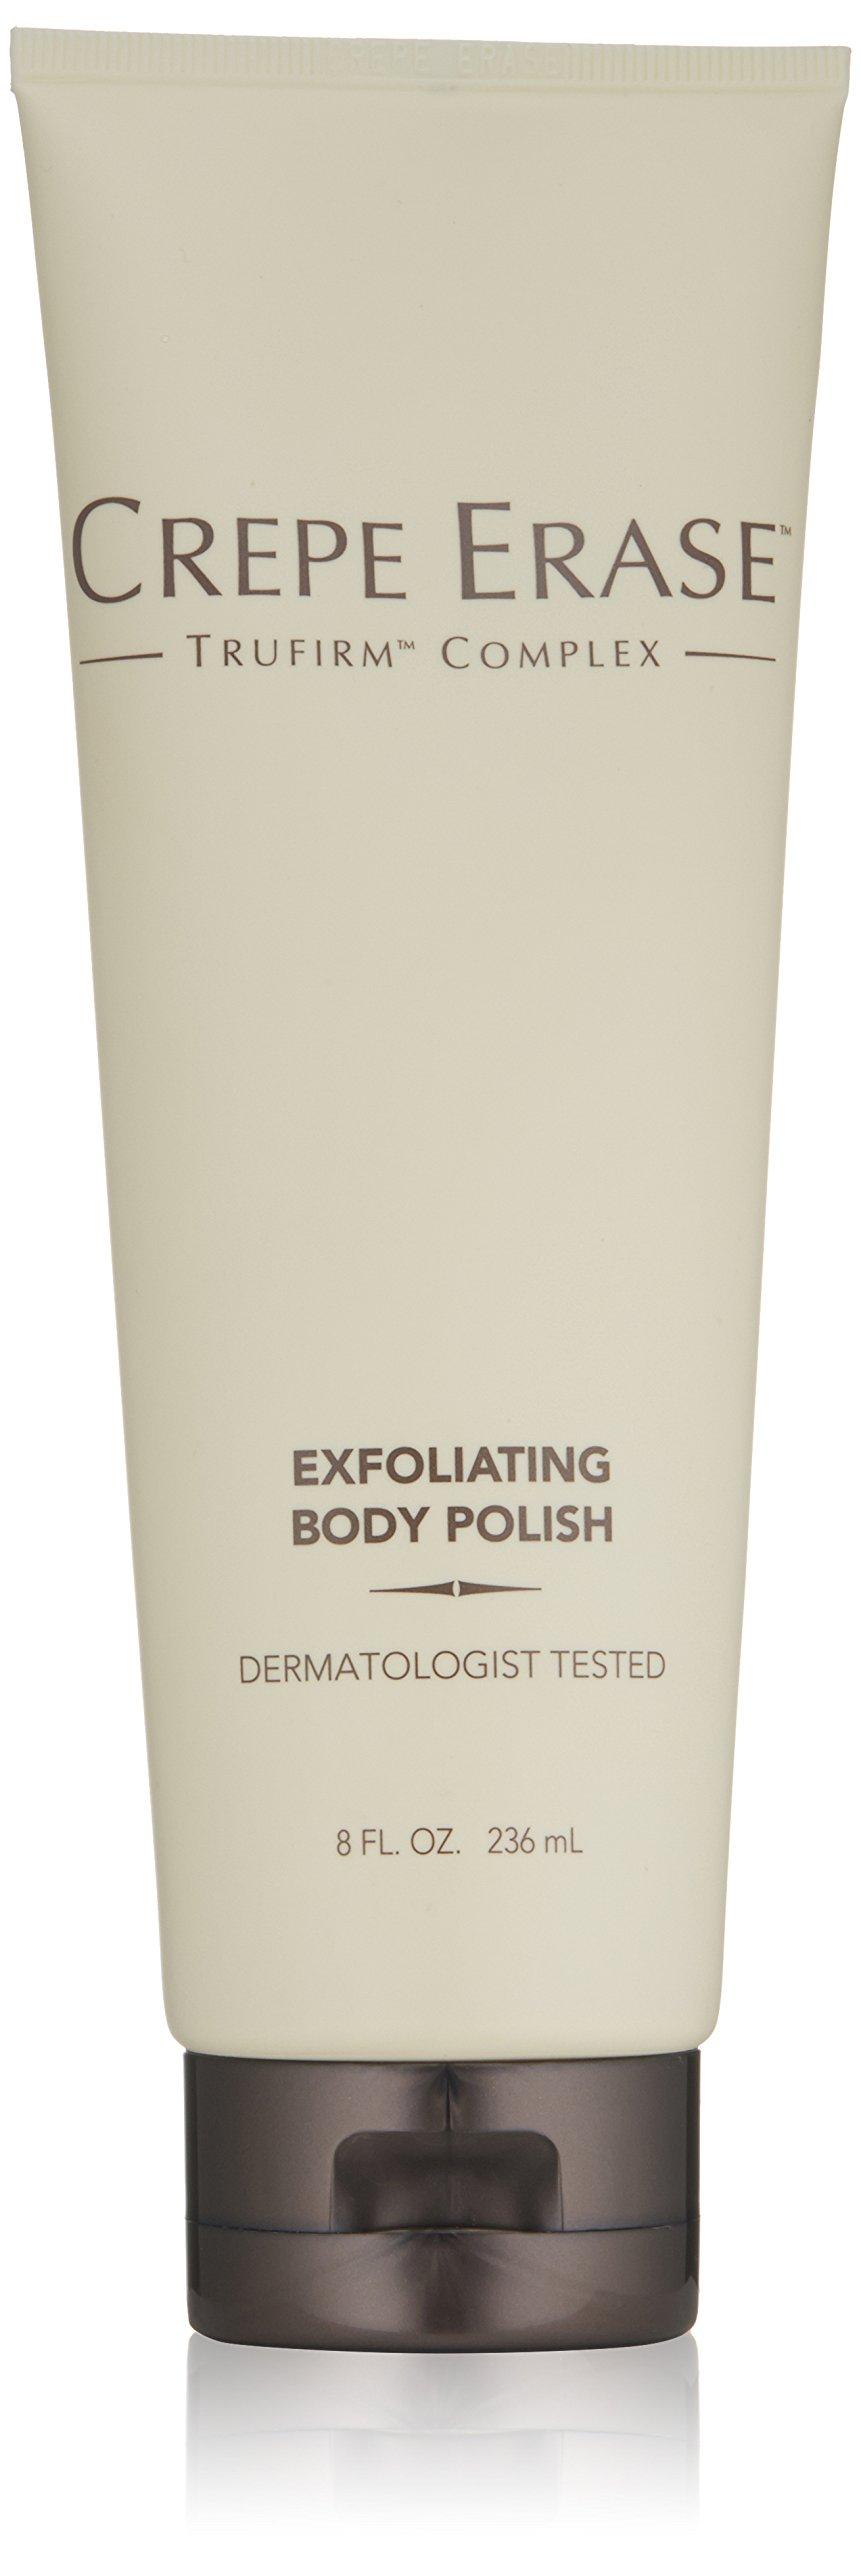 Crepe Erase – Exfoliating Body Polish – Anti-Aging Body Scrub – AHA Skin Smoothing Exfoliator and TruFirm Complex – 8 Fluid Ounces – CS.0052